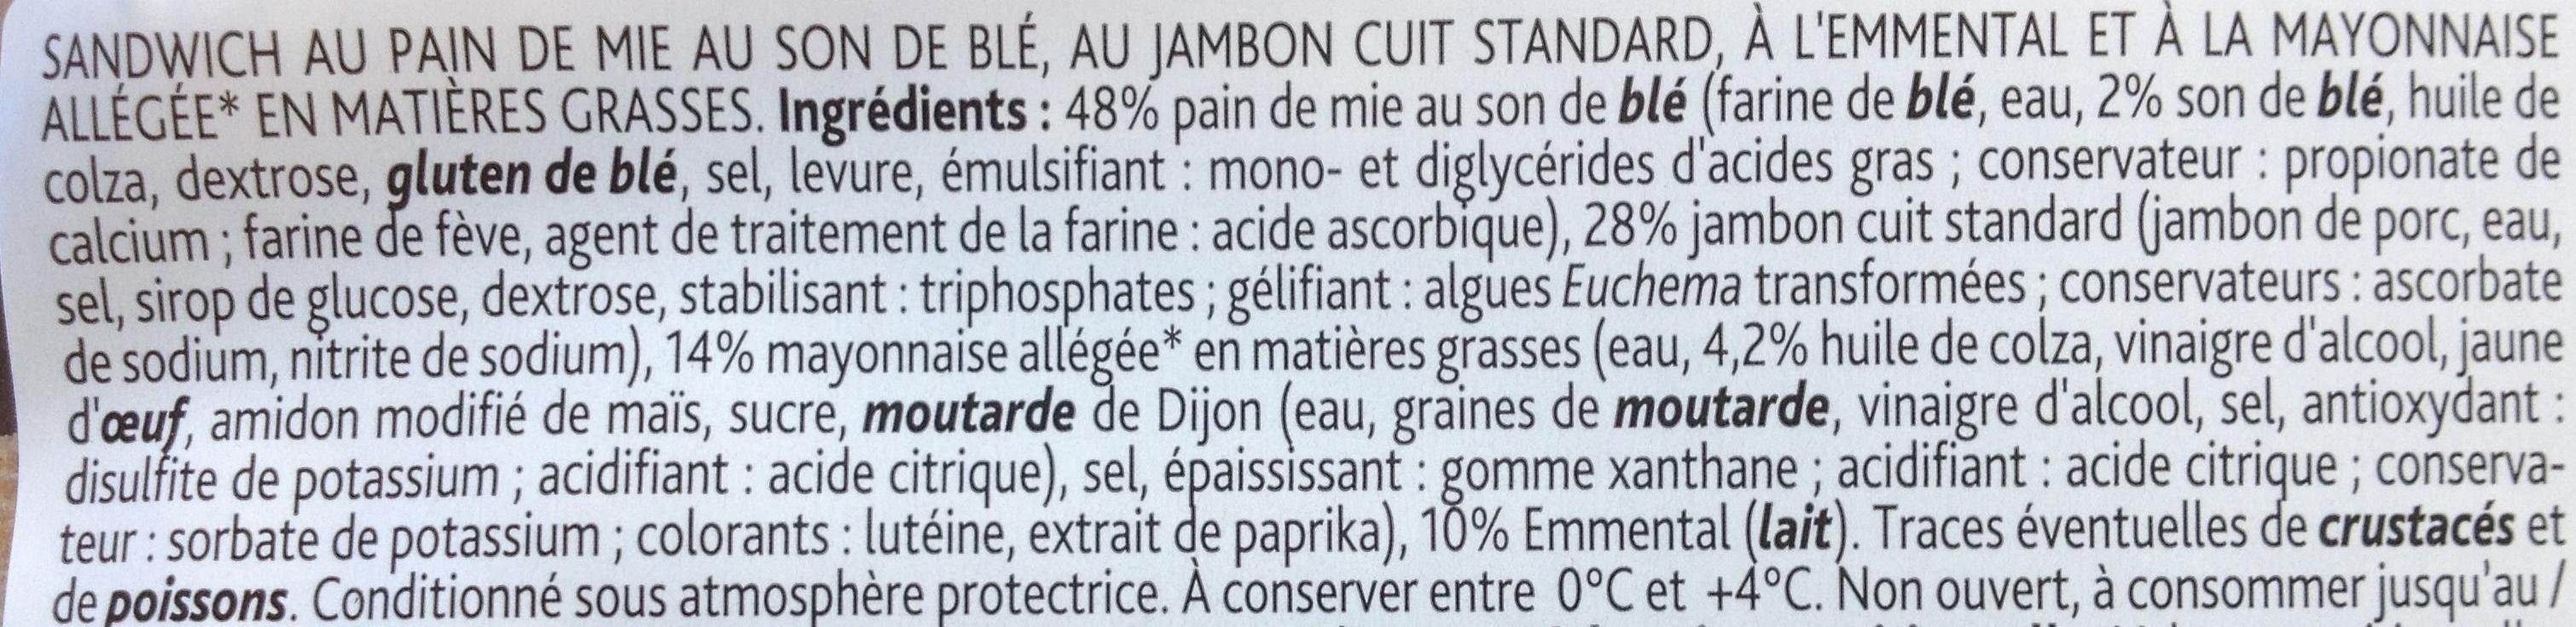 Club jambon emmental mayonnaise - Ingrédients